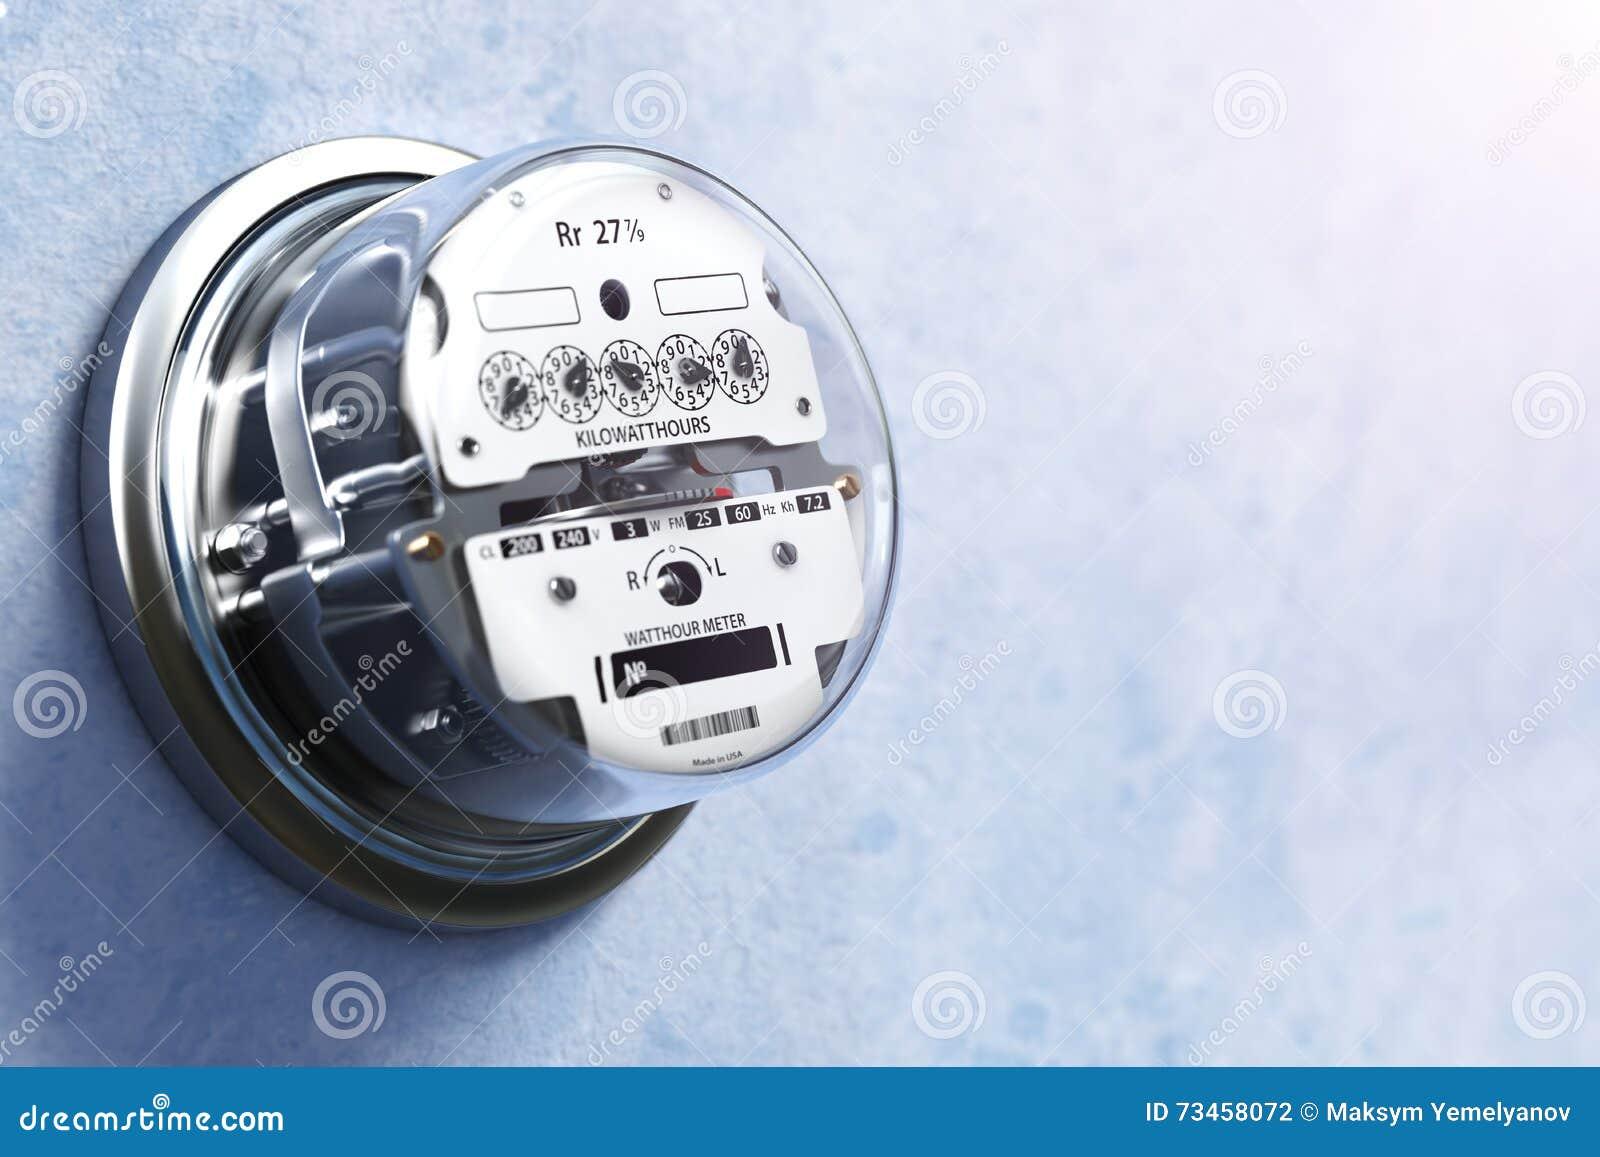 Analog Electric Meter : Analog electric meter on the wall stock illustration